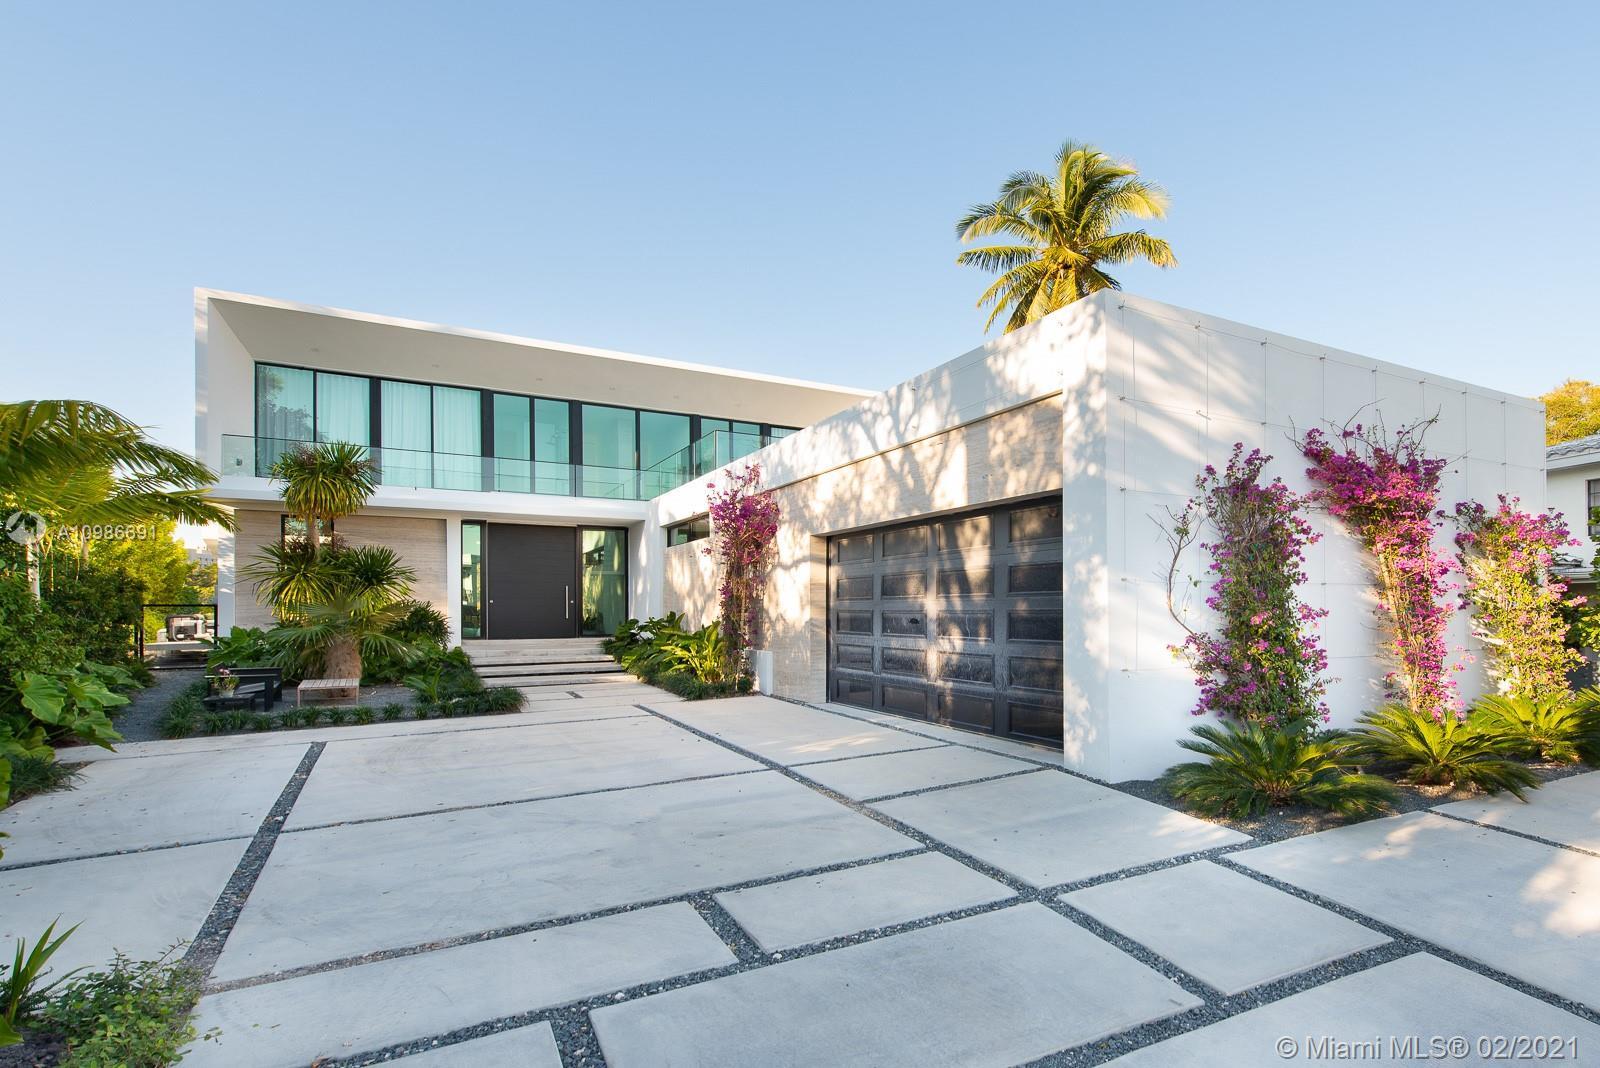 Sunset Lake #* - 3166 N Bay Rd #*, Miami Beach, FL 33140